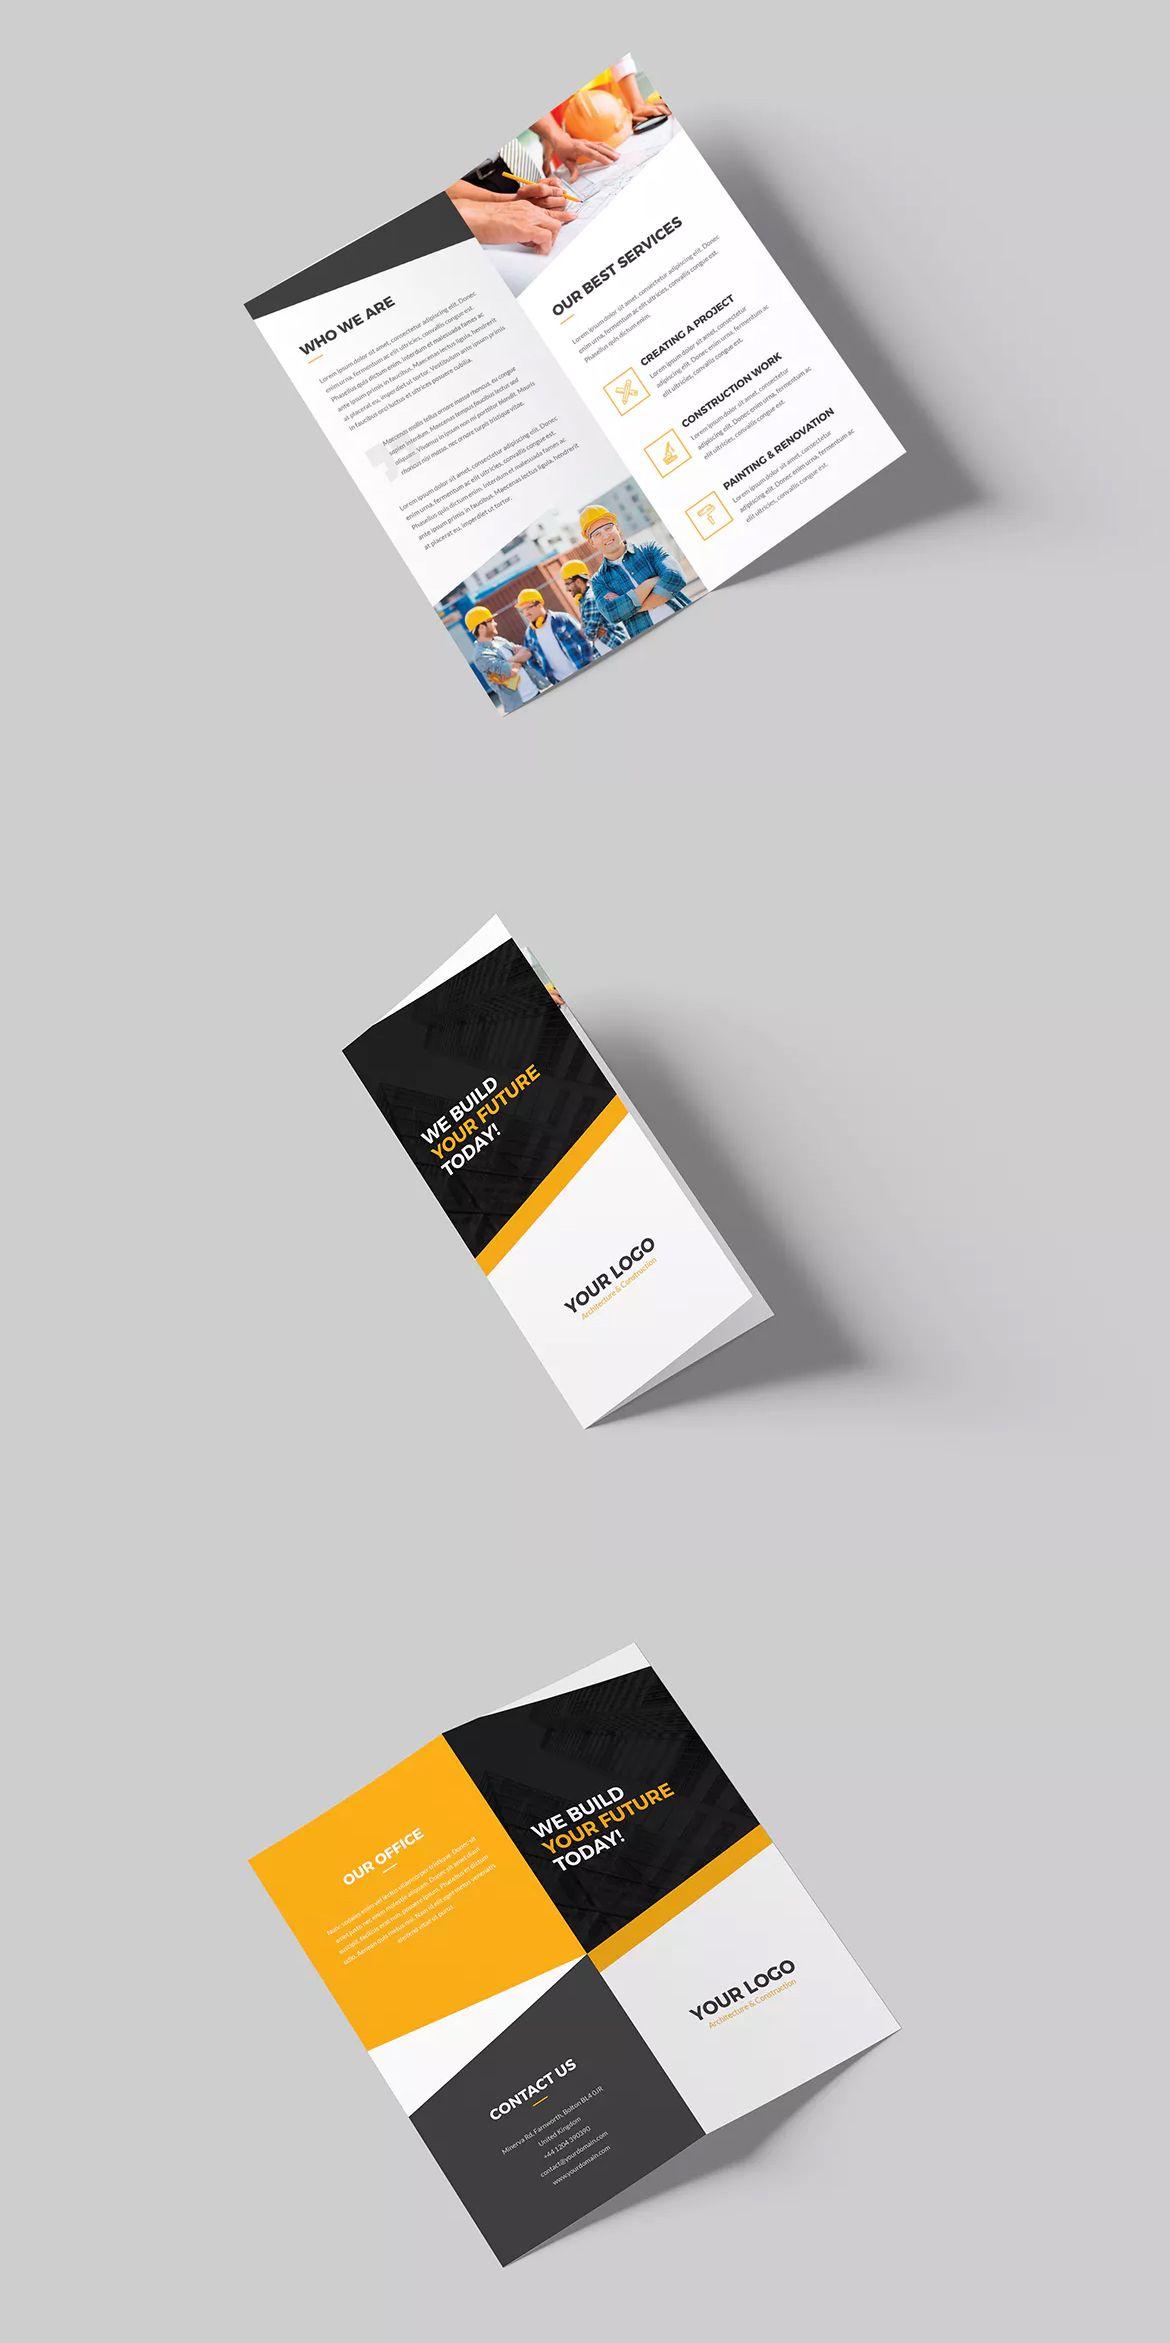 Architecture Construction BiFold DL Brochure Template PSD DL - Dl size flyer template